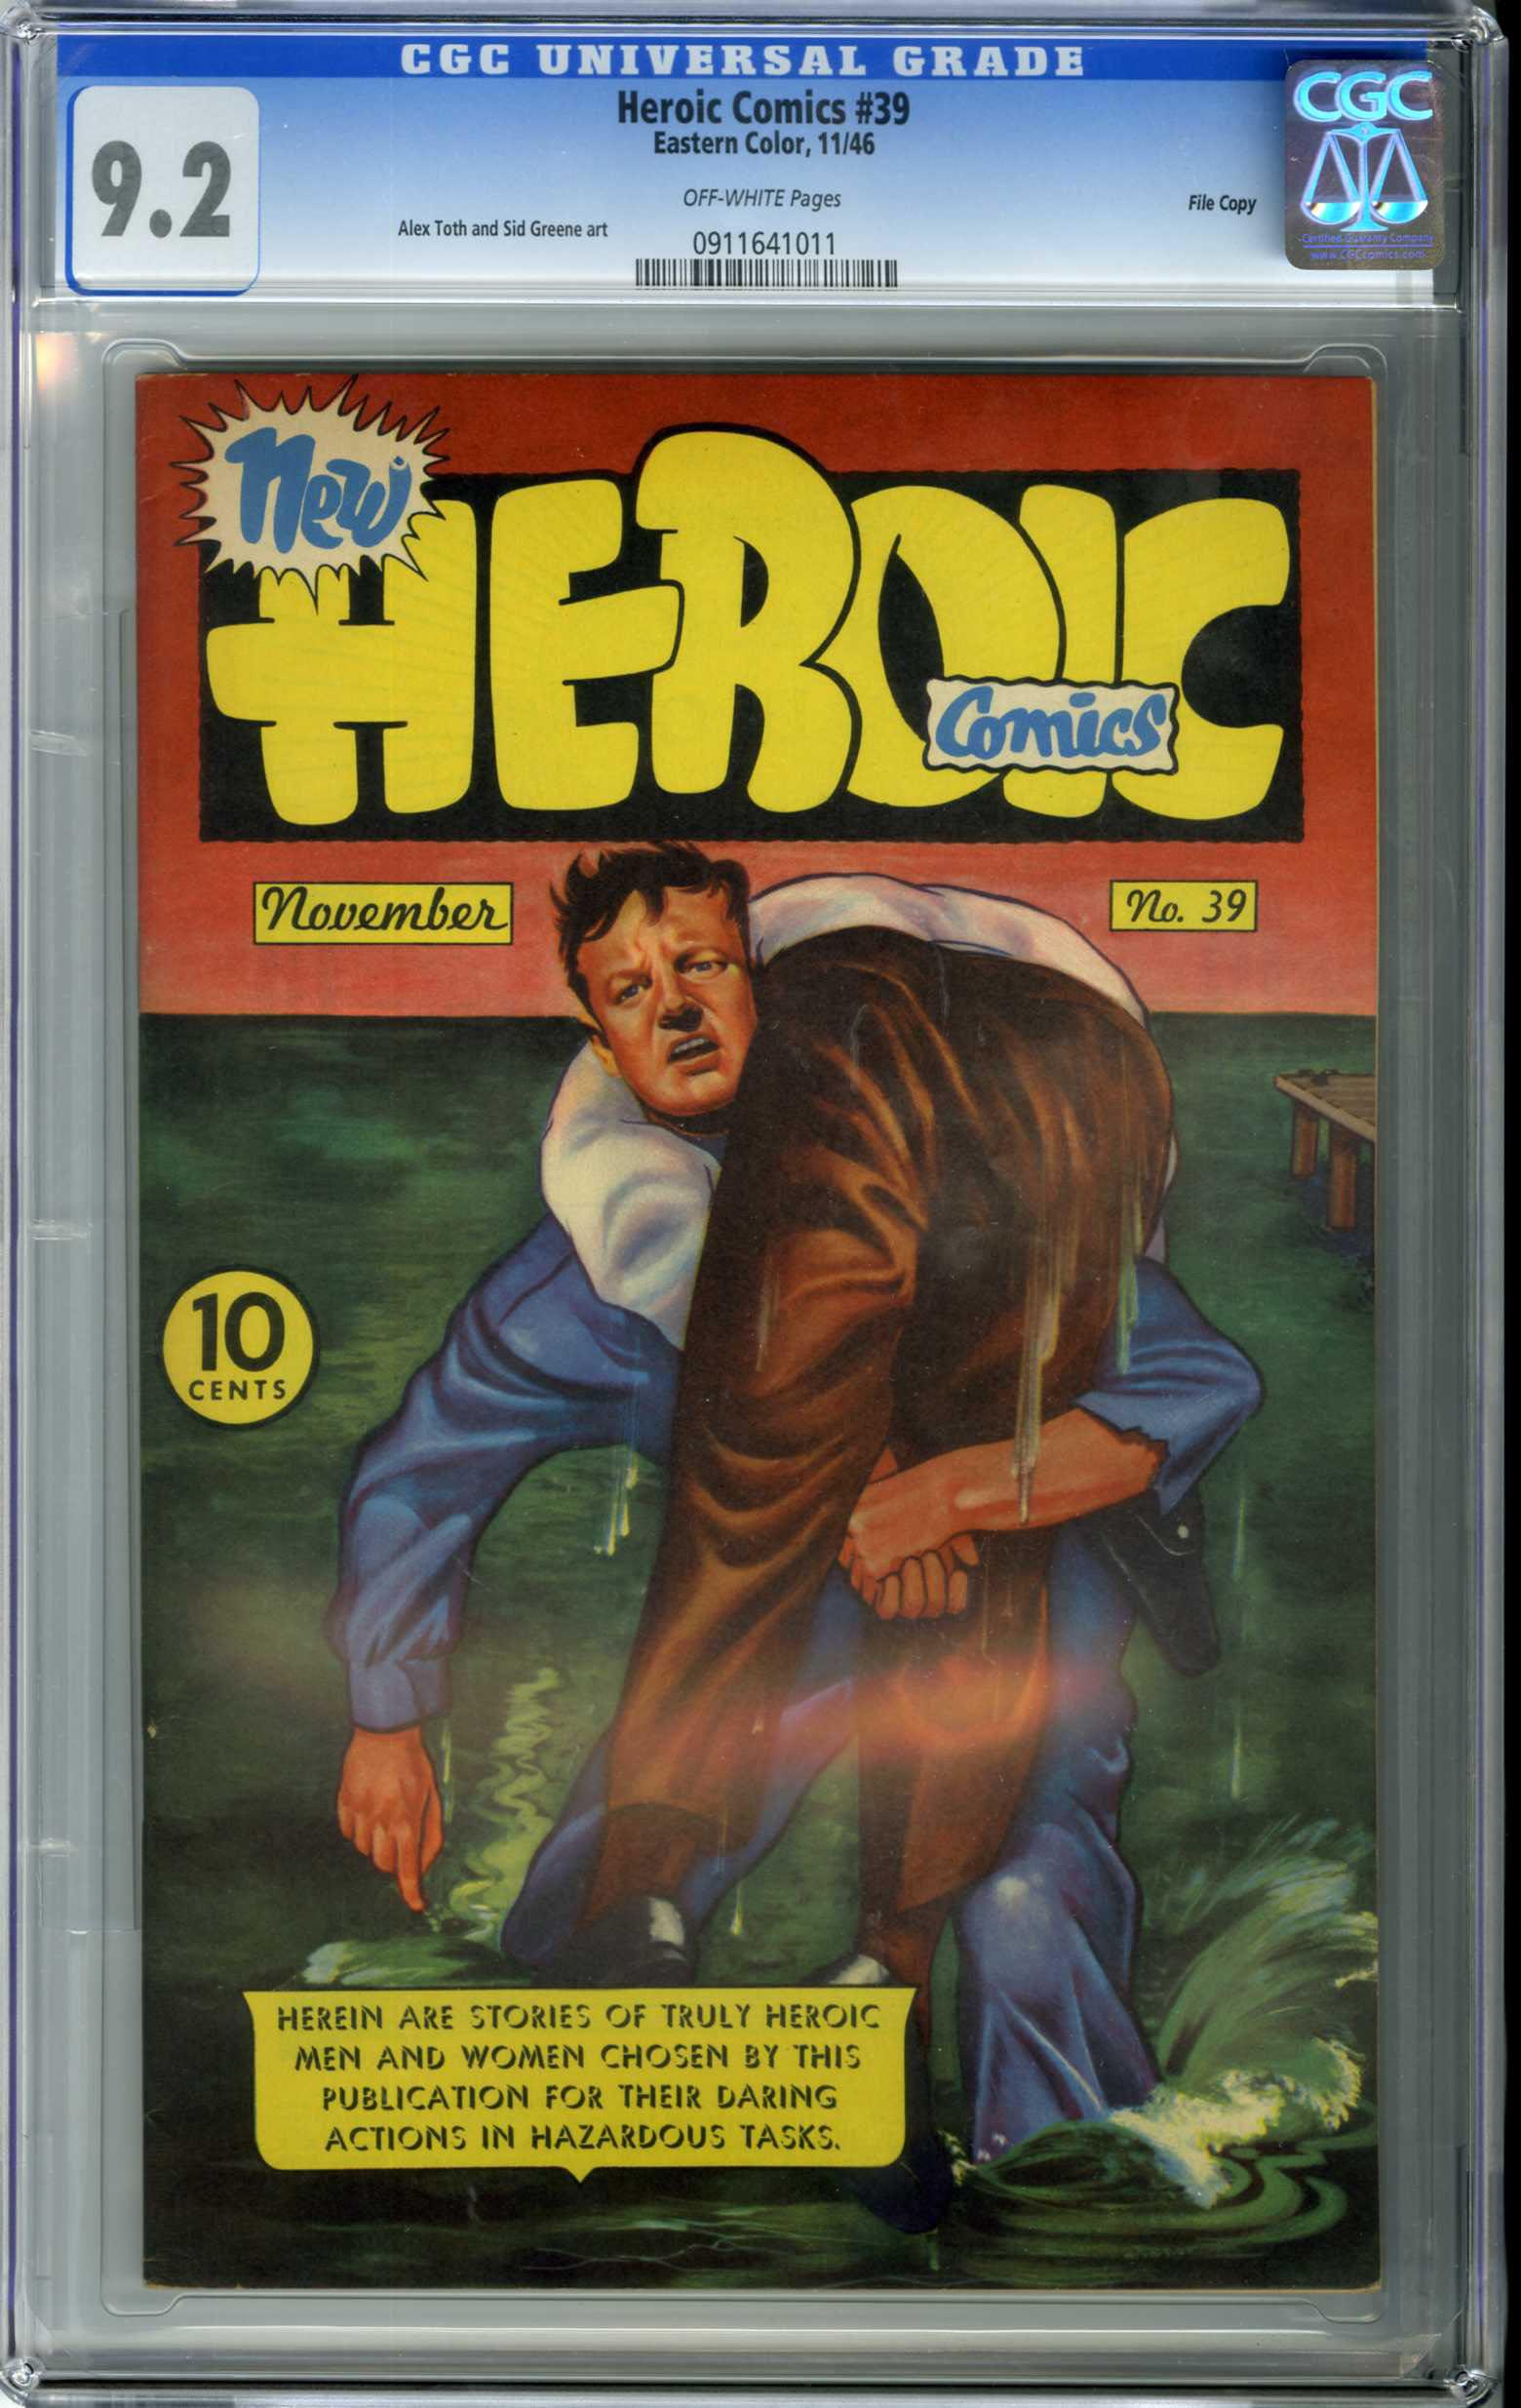 HEROIC COMICS #39 (1946) CGC NM- 9.2 OW Pages / FILE COPY / ALEX TOTH ART